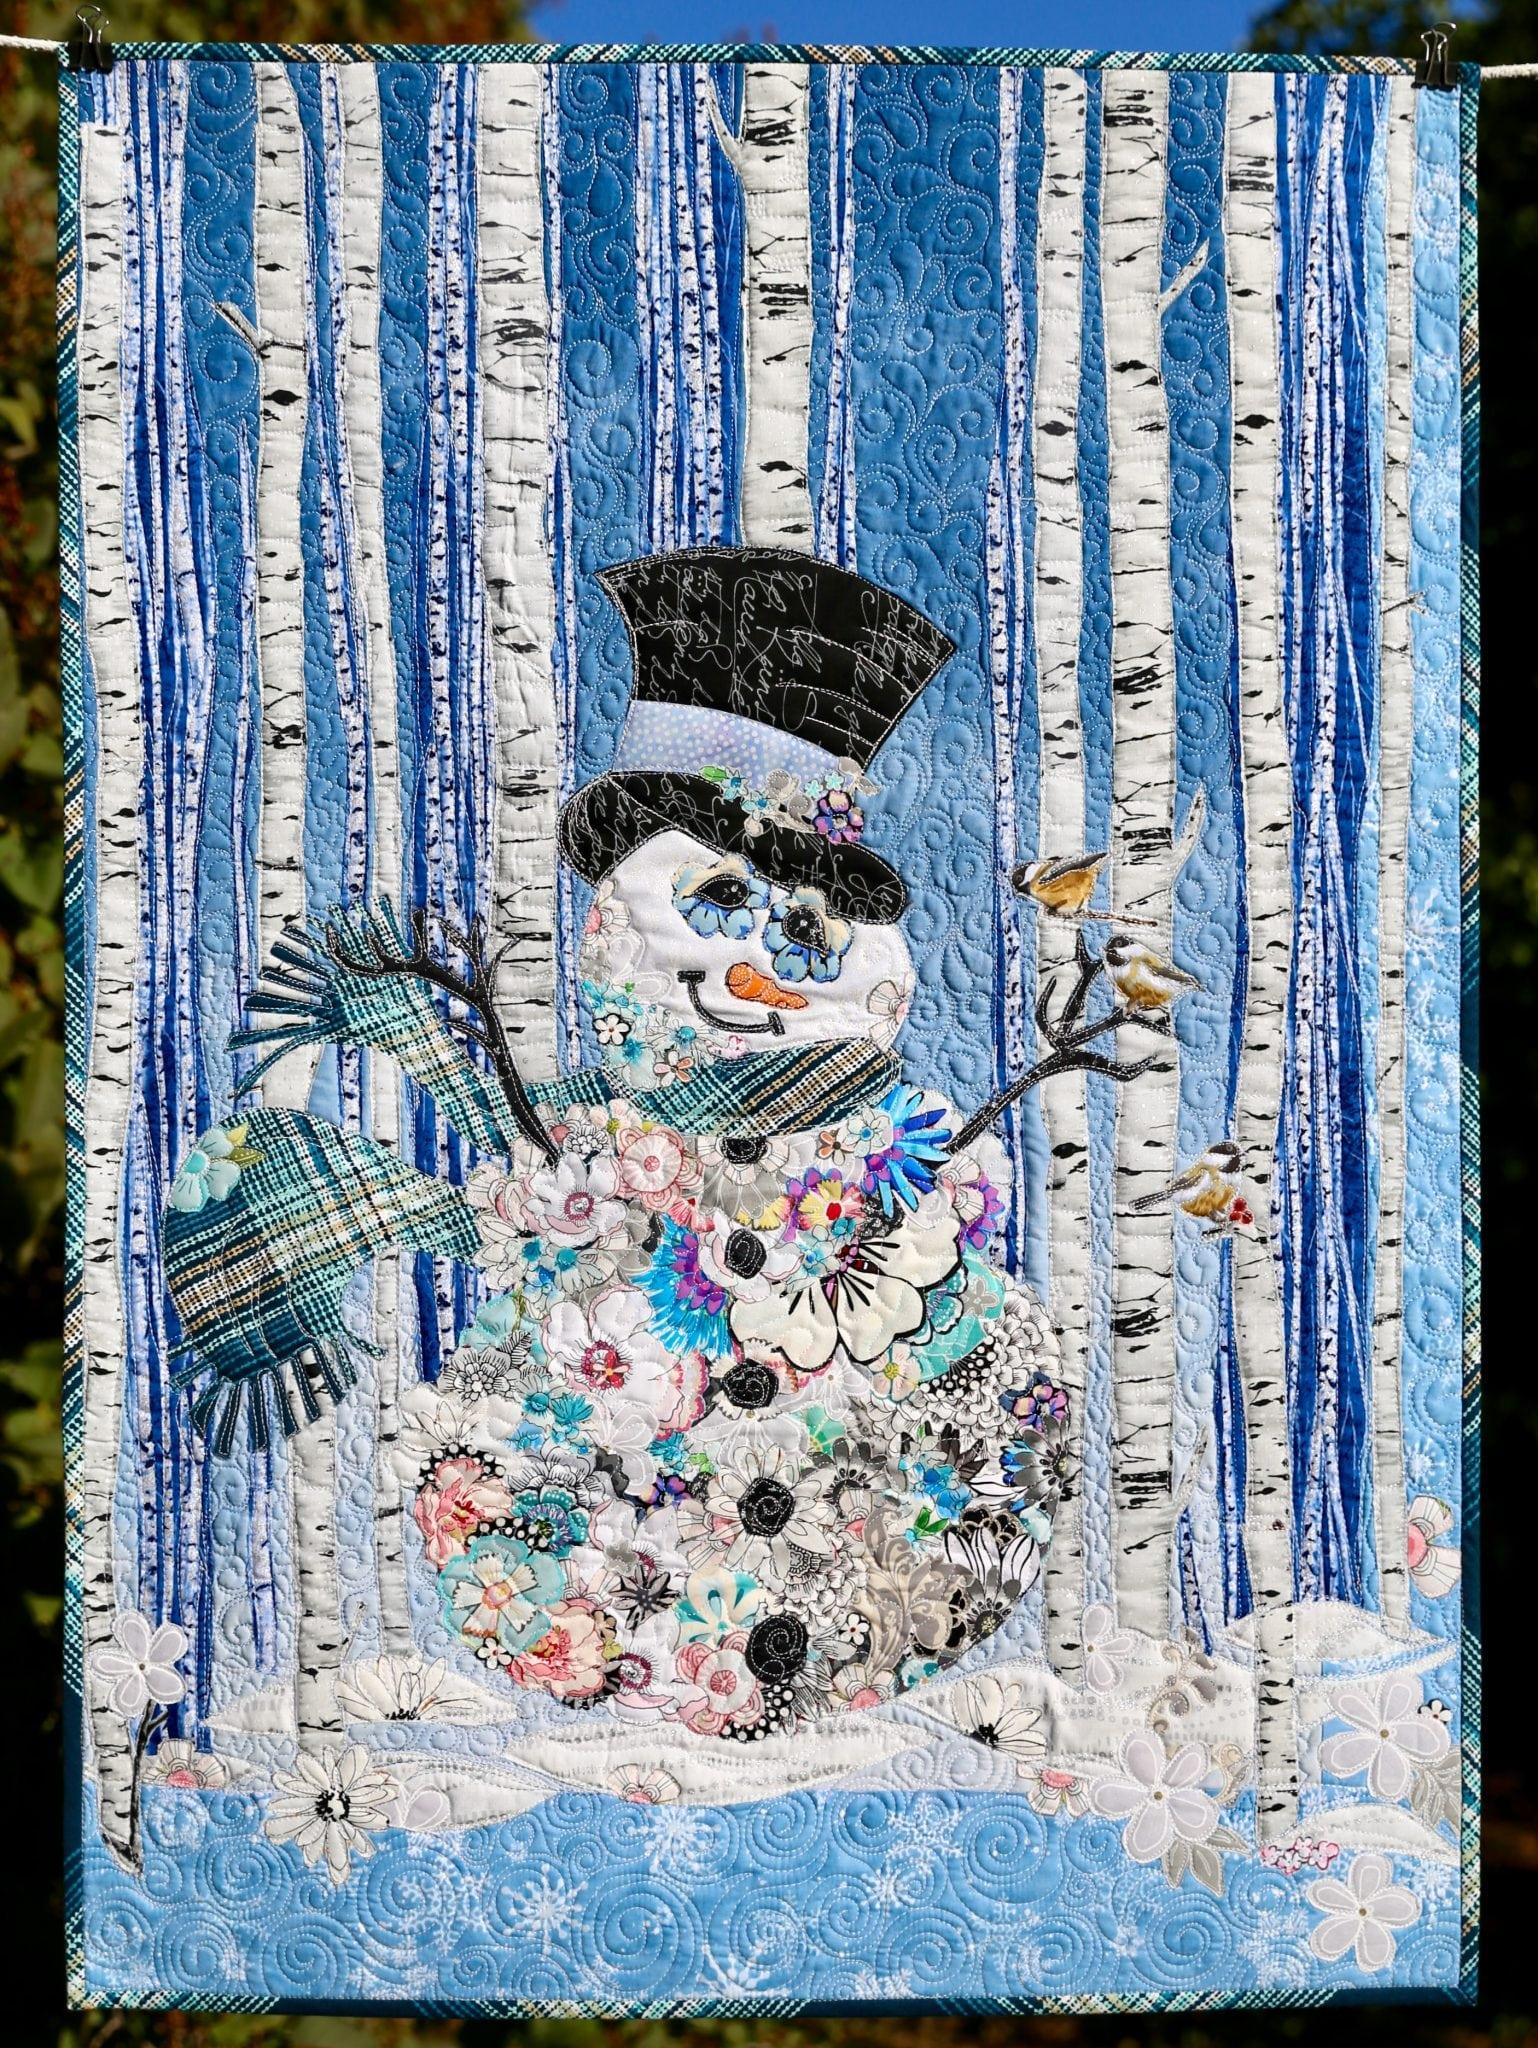 Sir Frosty Snowman Collage Paper Pattern Marveles Art